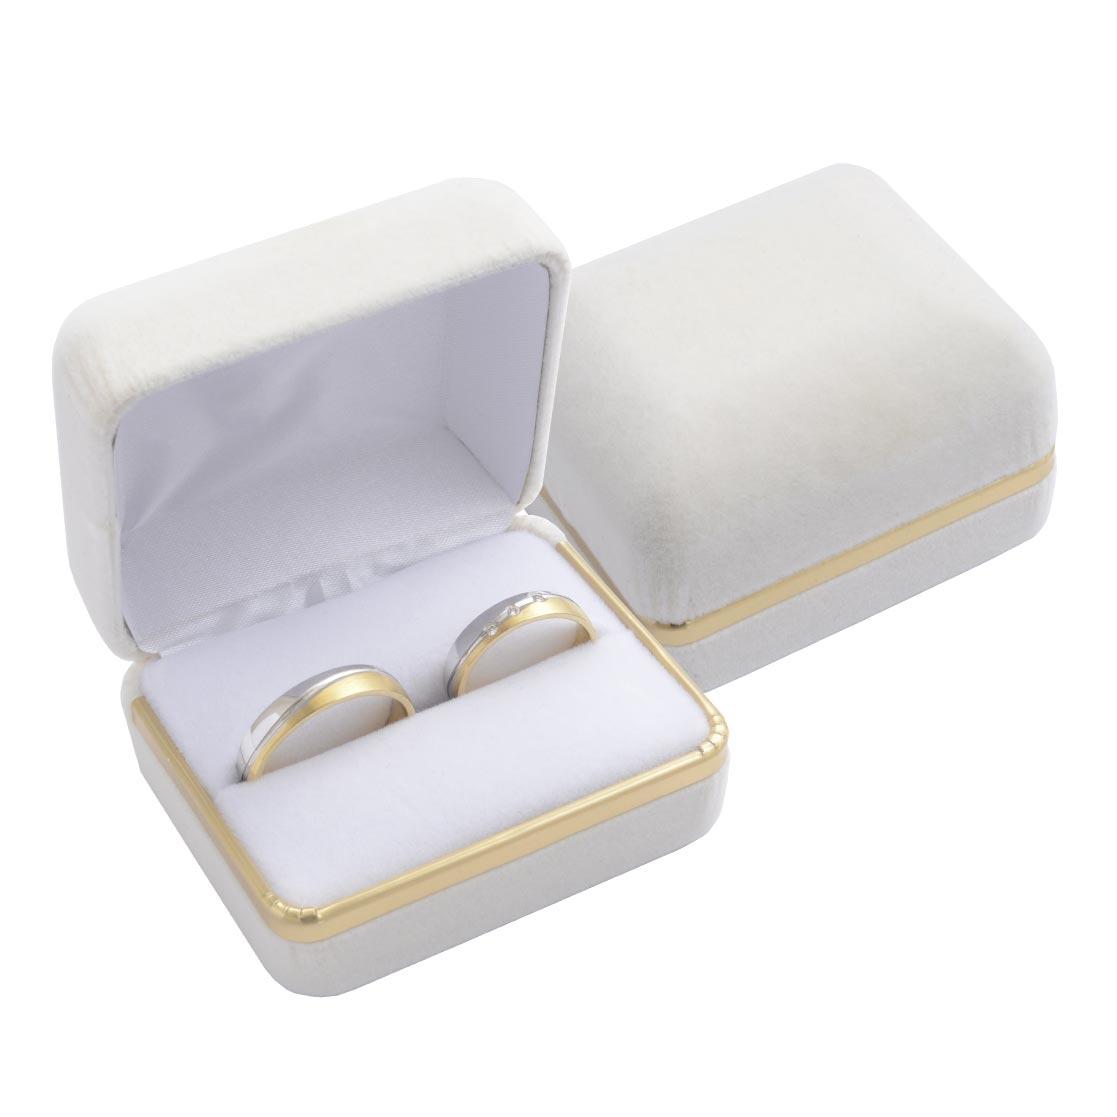 Semišová darčeková krabička na snubný prsteňe